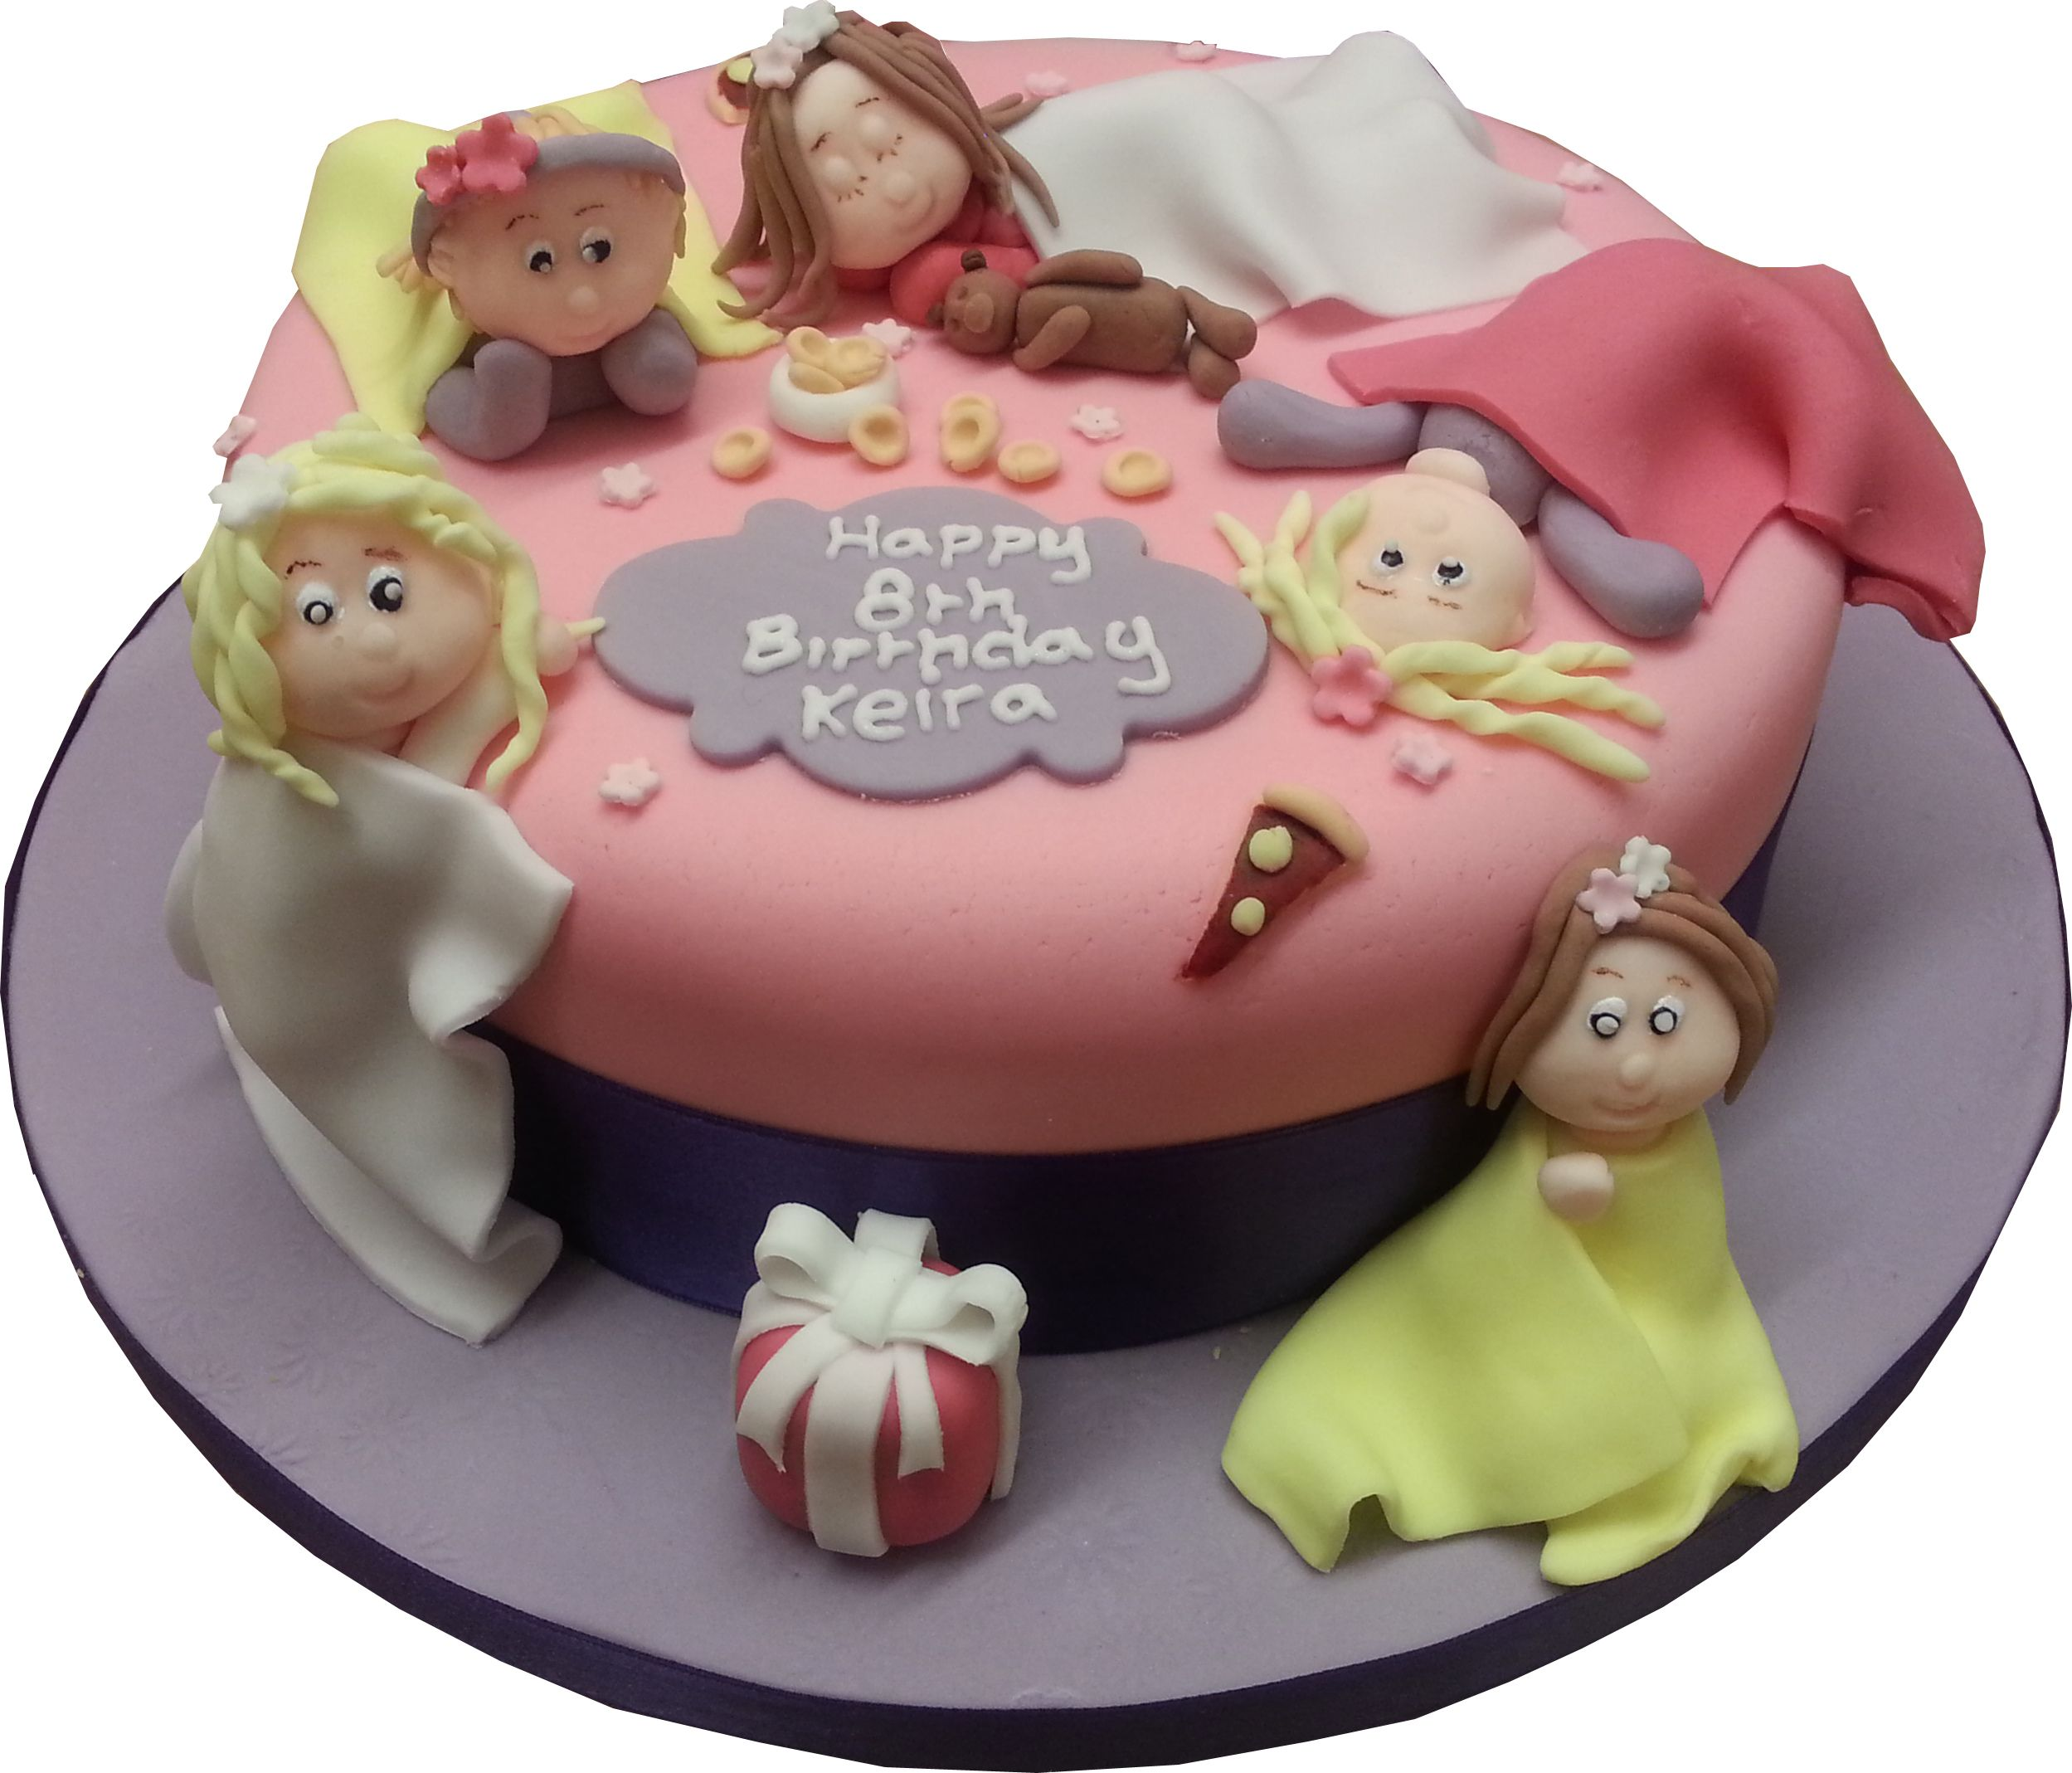 sleepover cake starry cakes northampton www starry design studio on custom made birthday cakes northampton